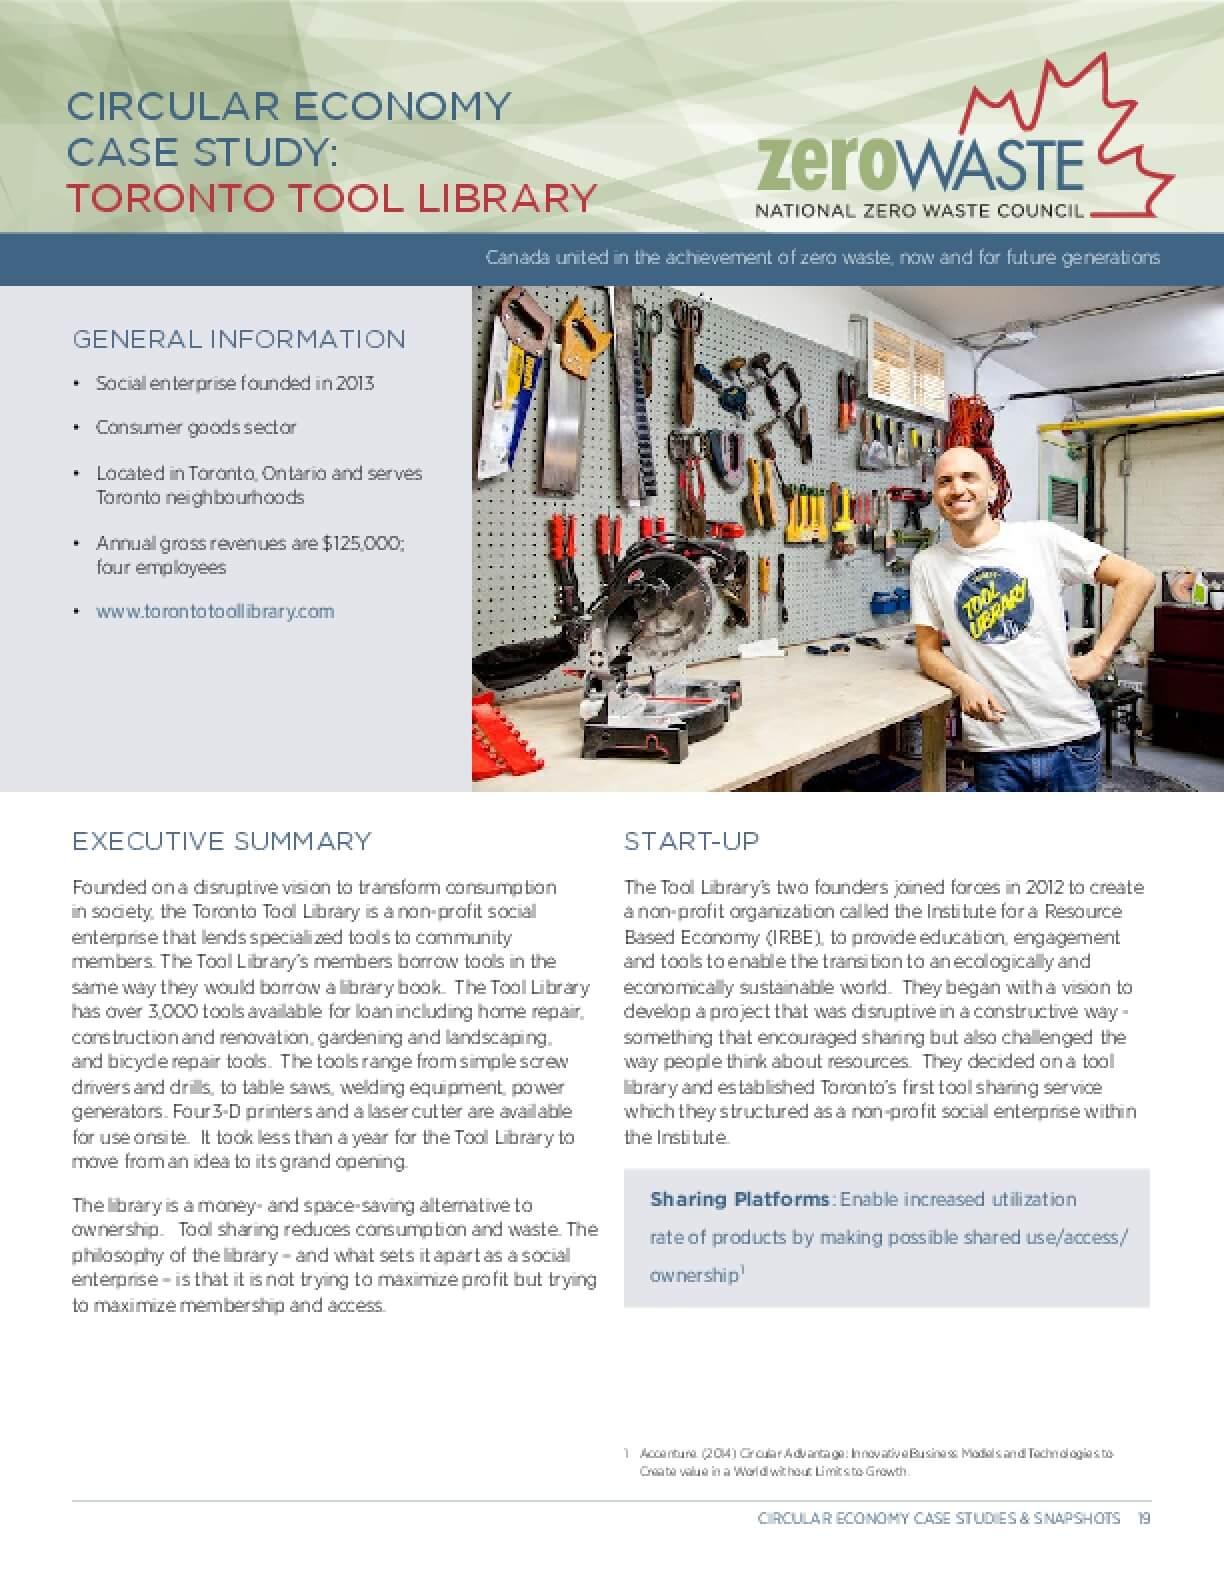 Circular Economy Case Study: Toronto Tool Library